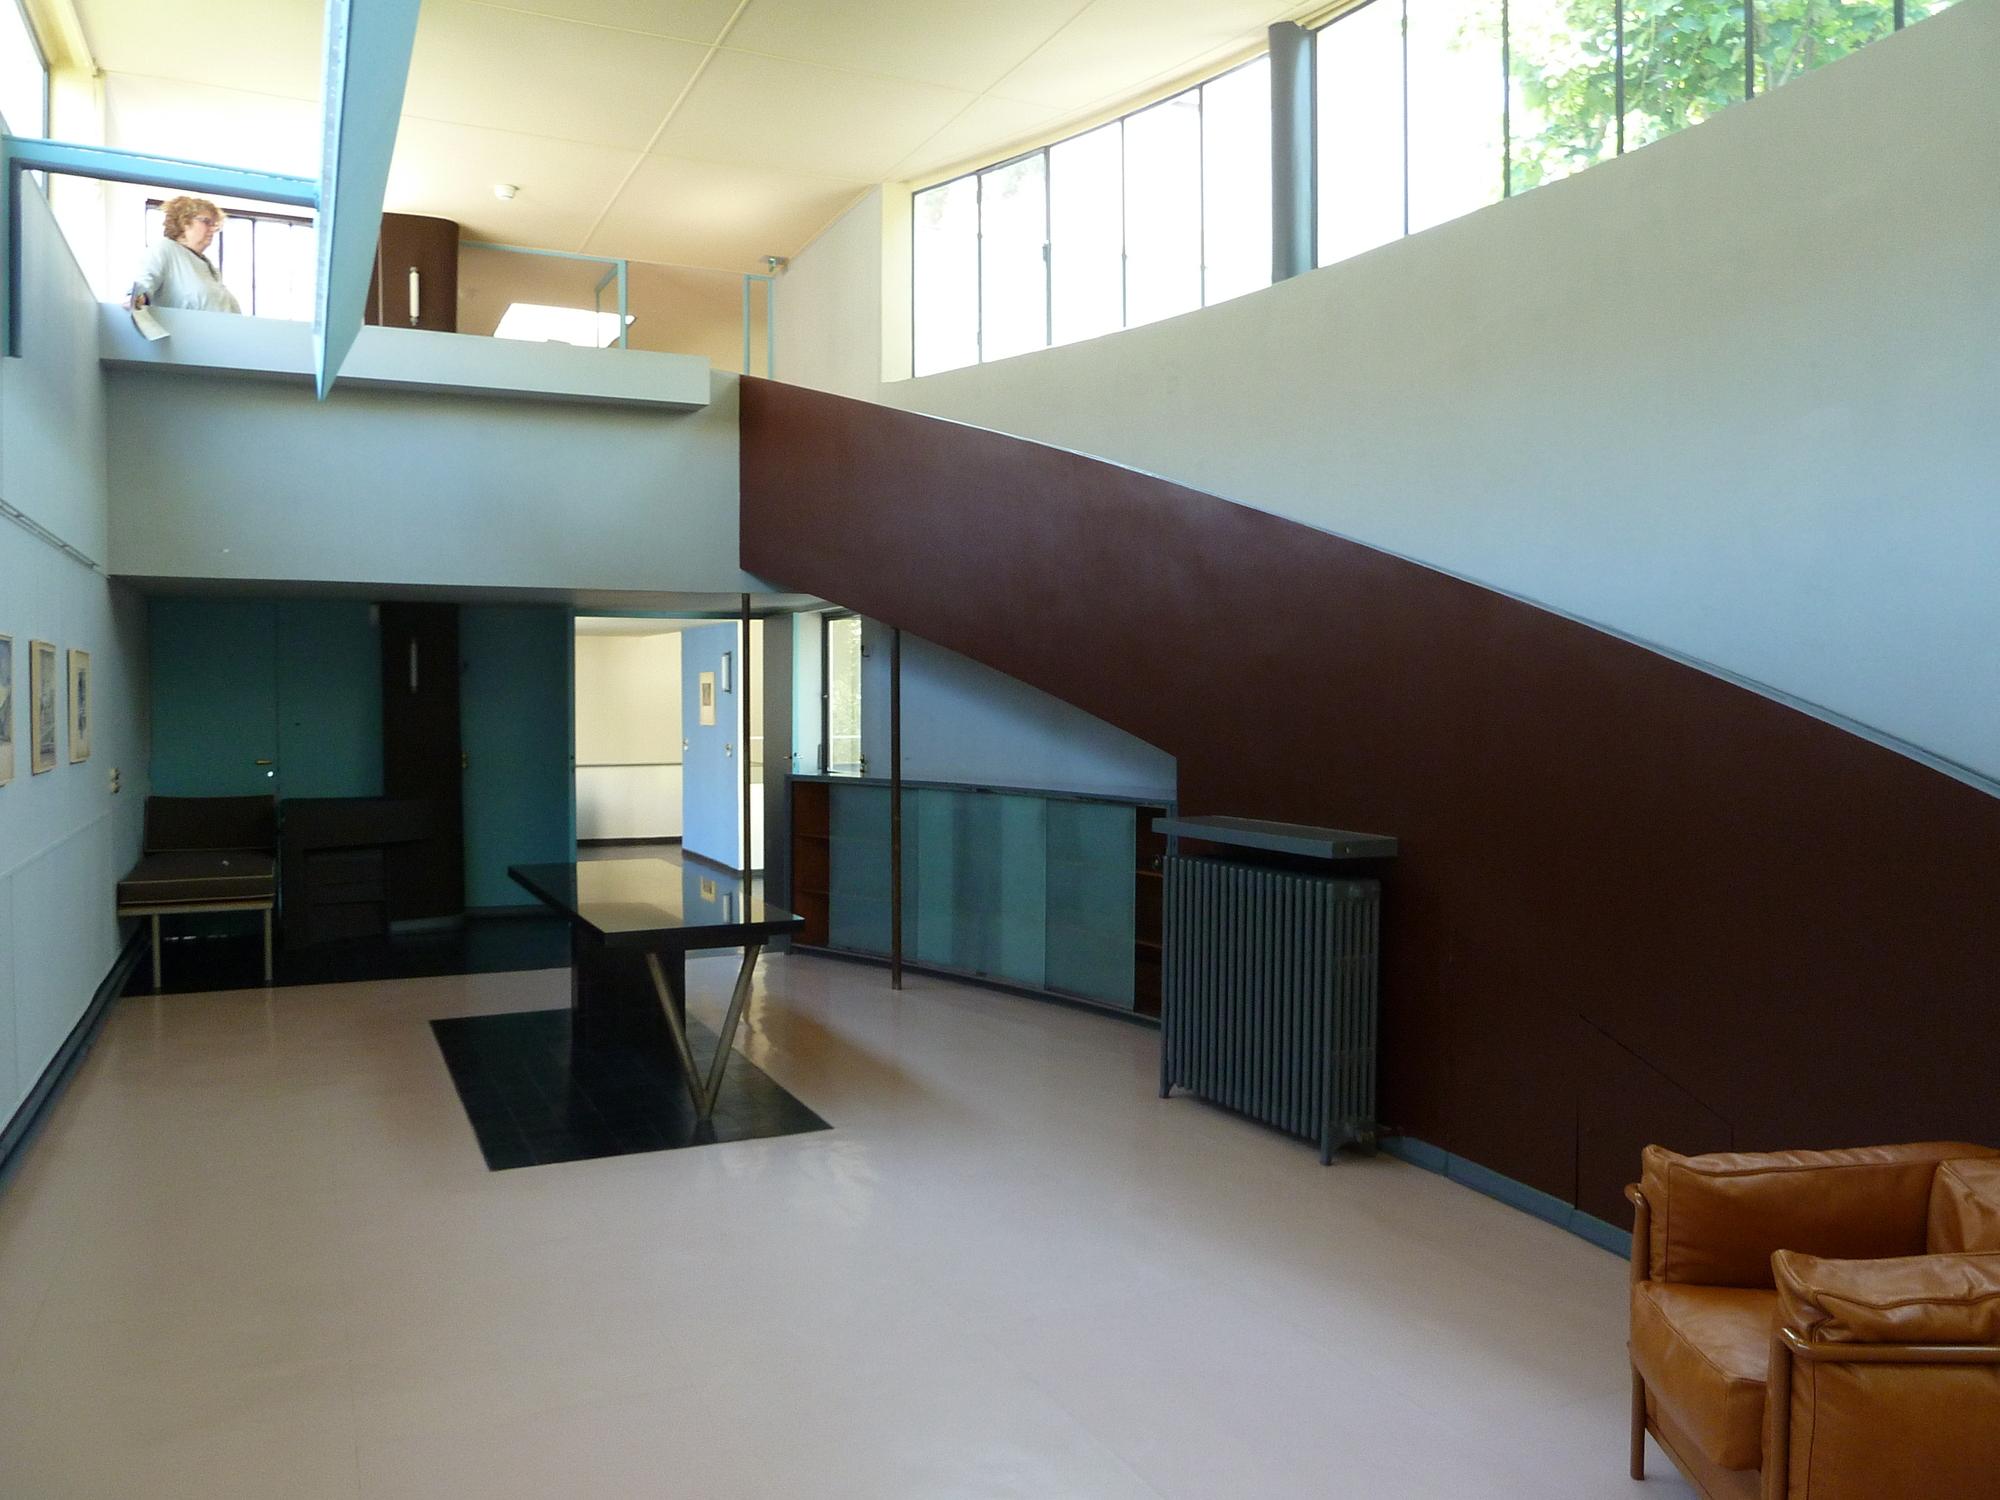 Maison La Roche Corbusier Paris gallery of see the 17 le corbusier projects named as unesco